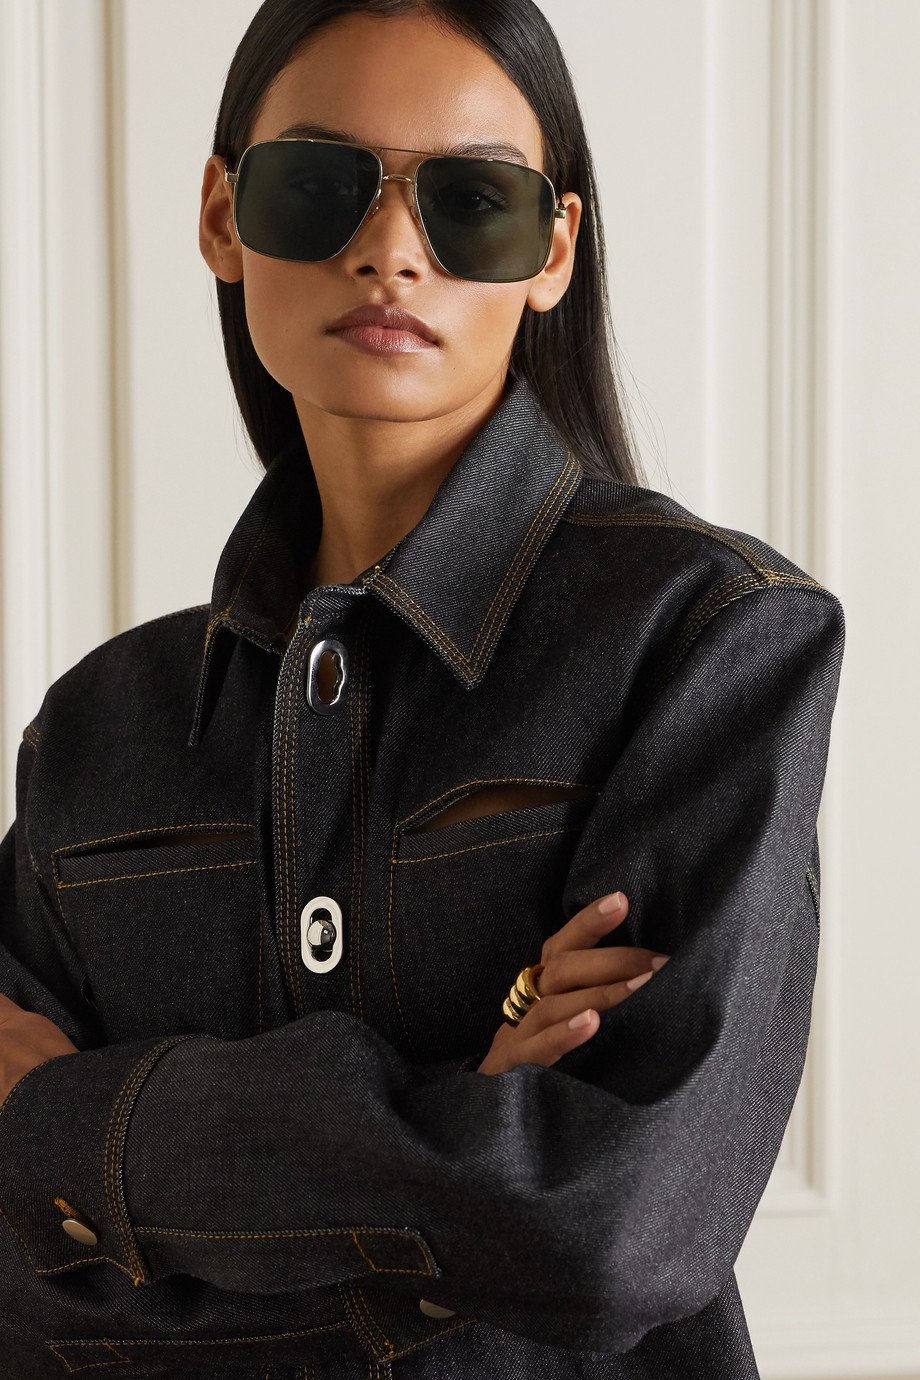 Givenchy Goldfarbene Pilotensonnenbrille mit Details aus Azetat in Hornoptik